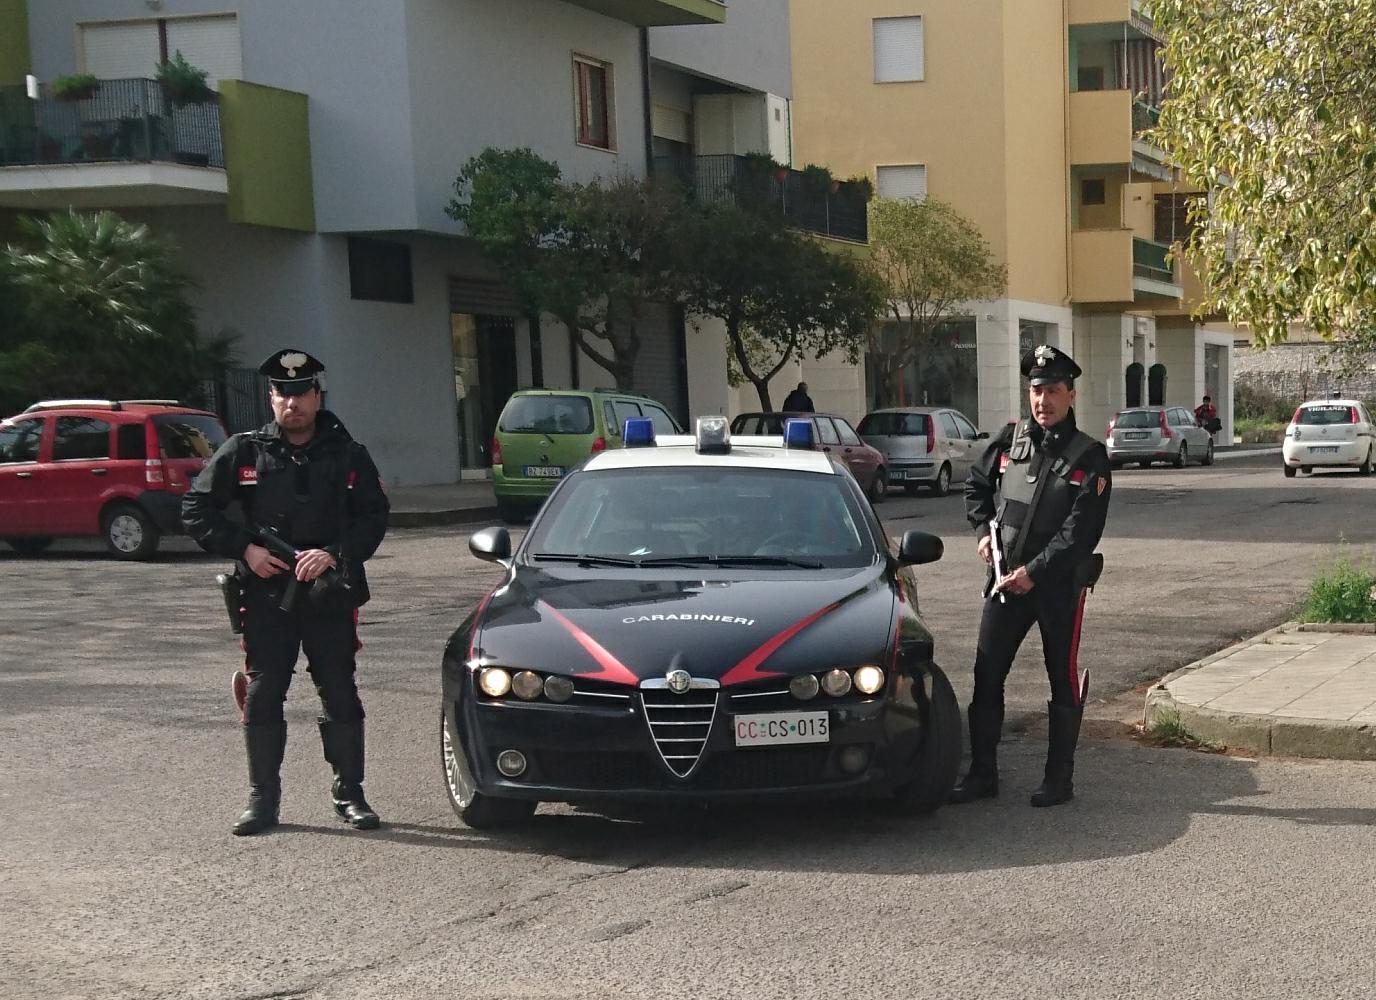 Radiomobile carabinieri cs